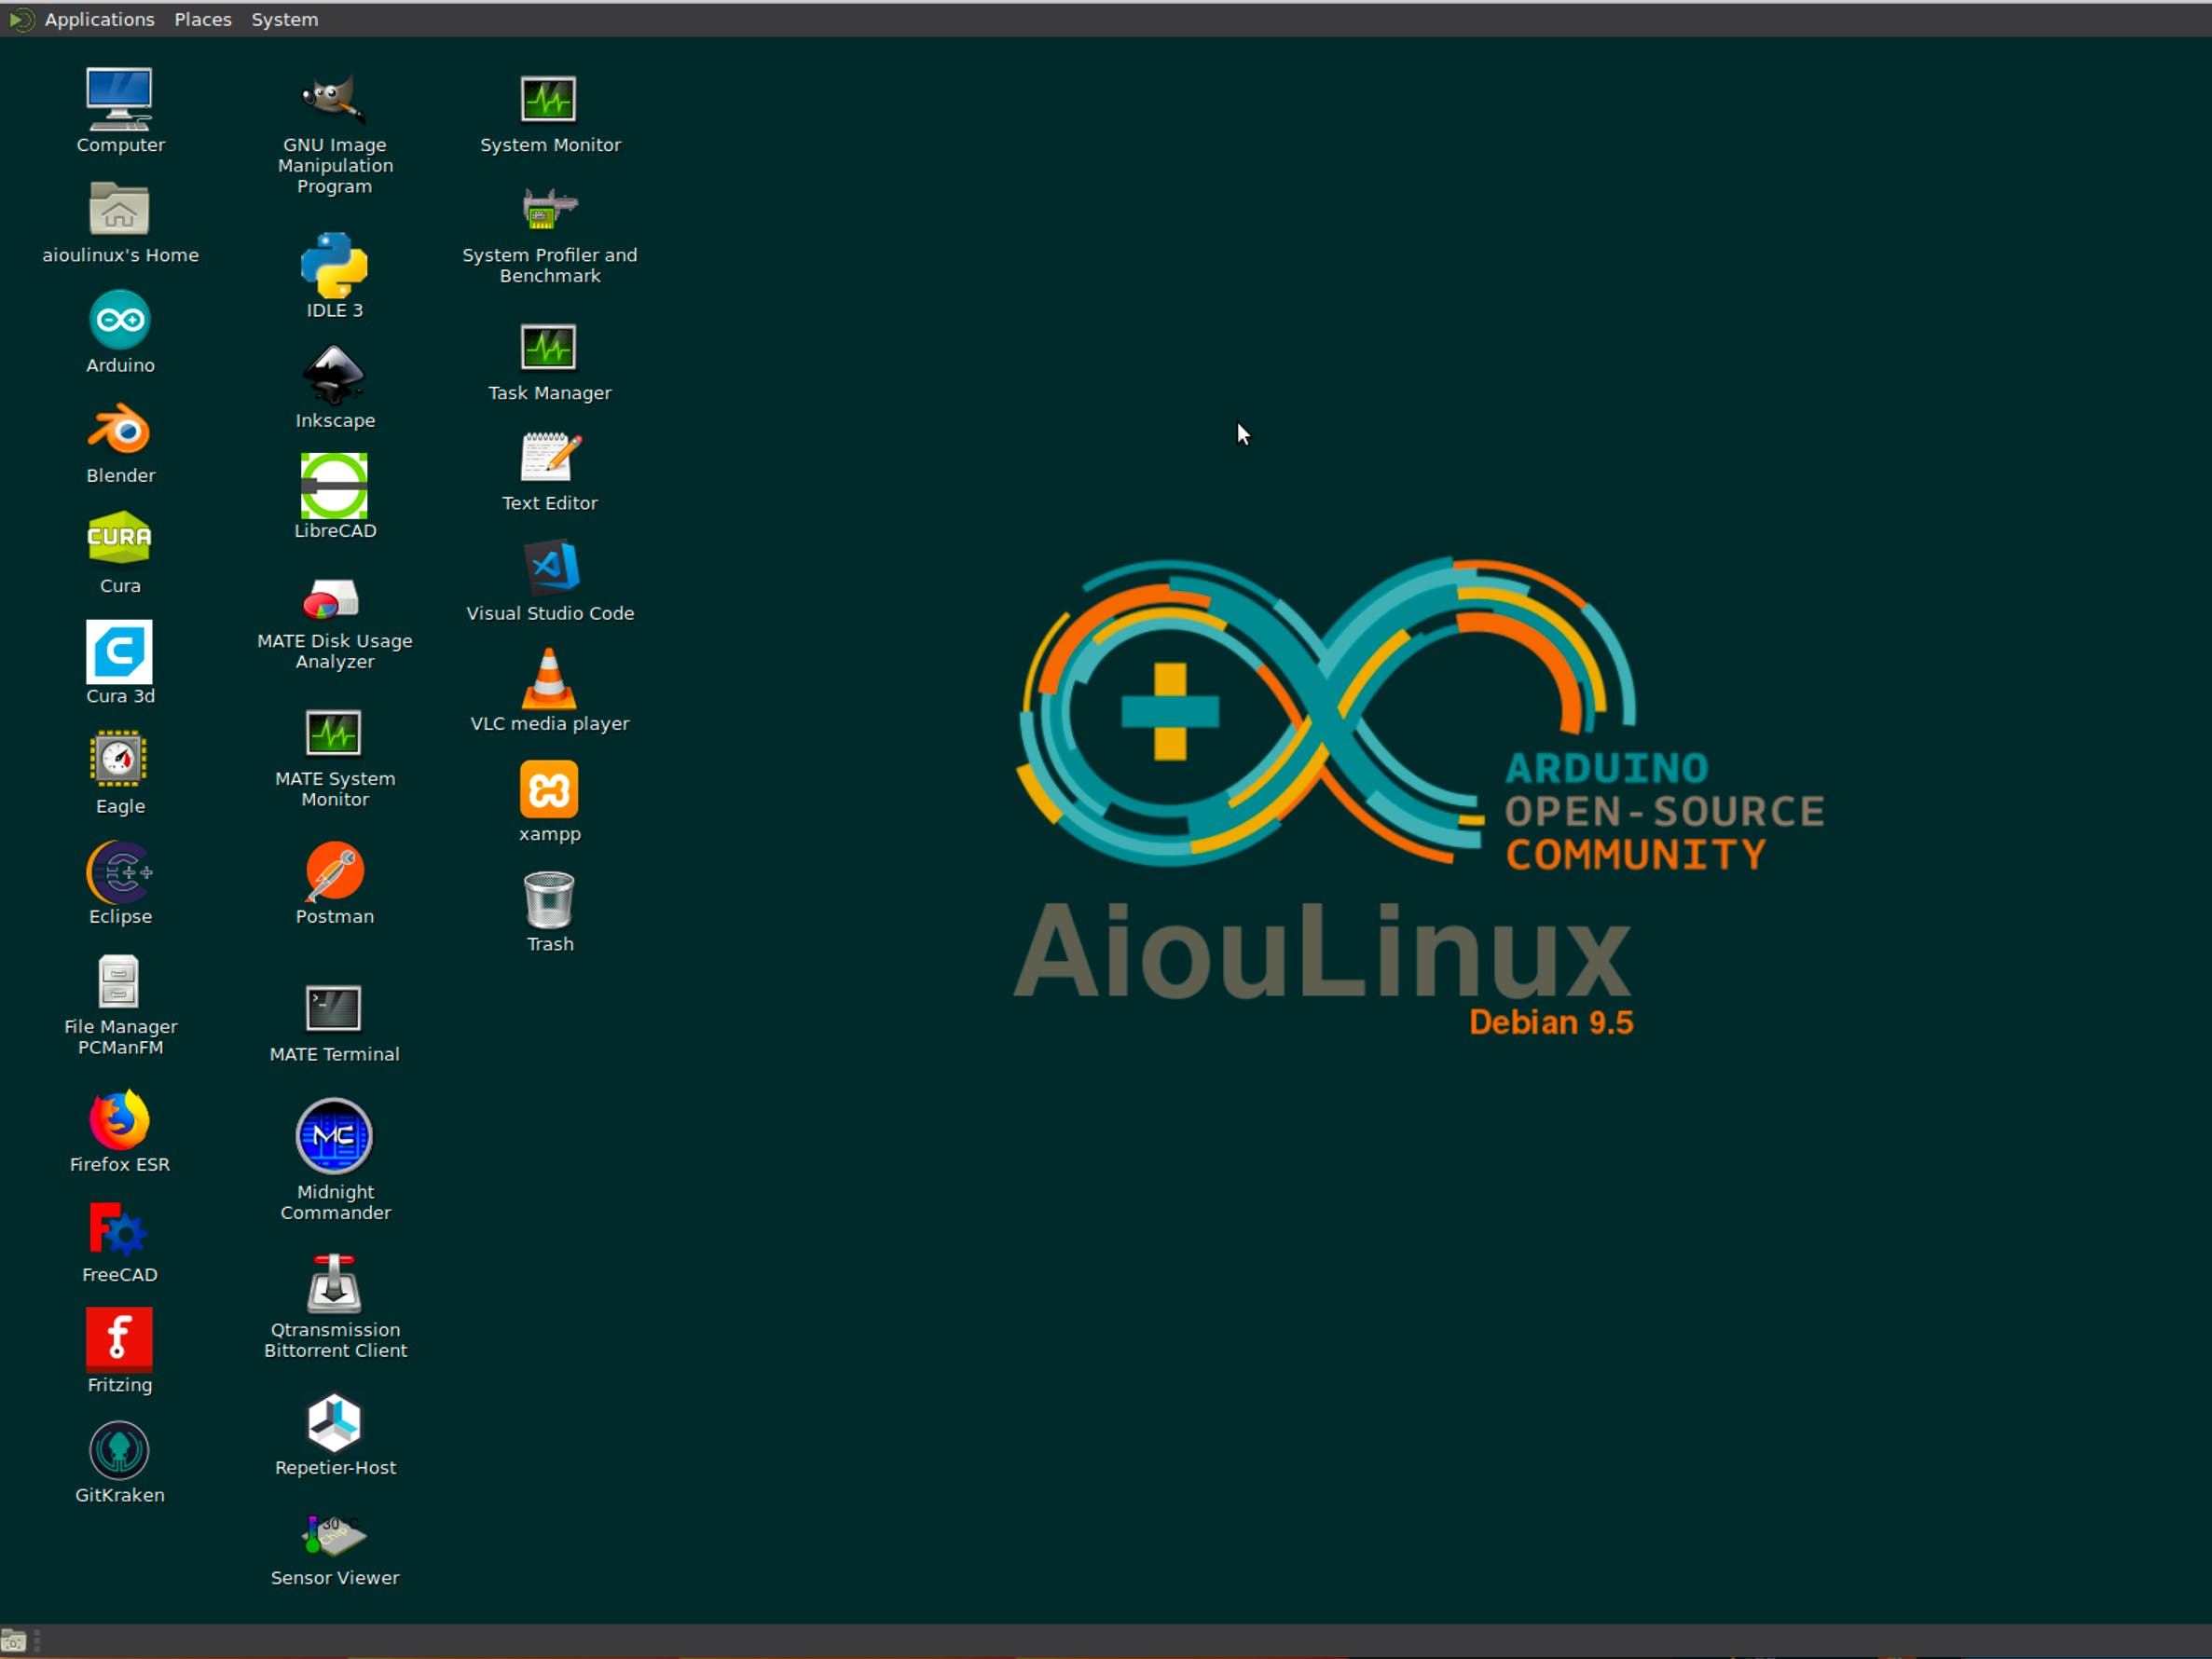 AiouLinux